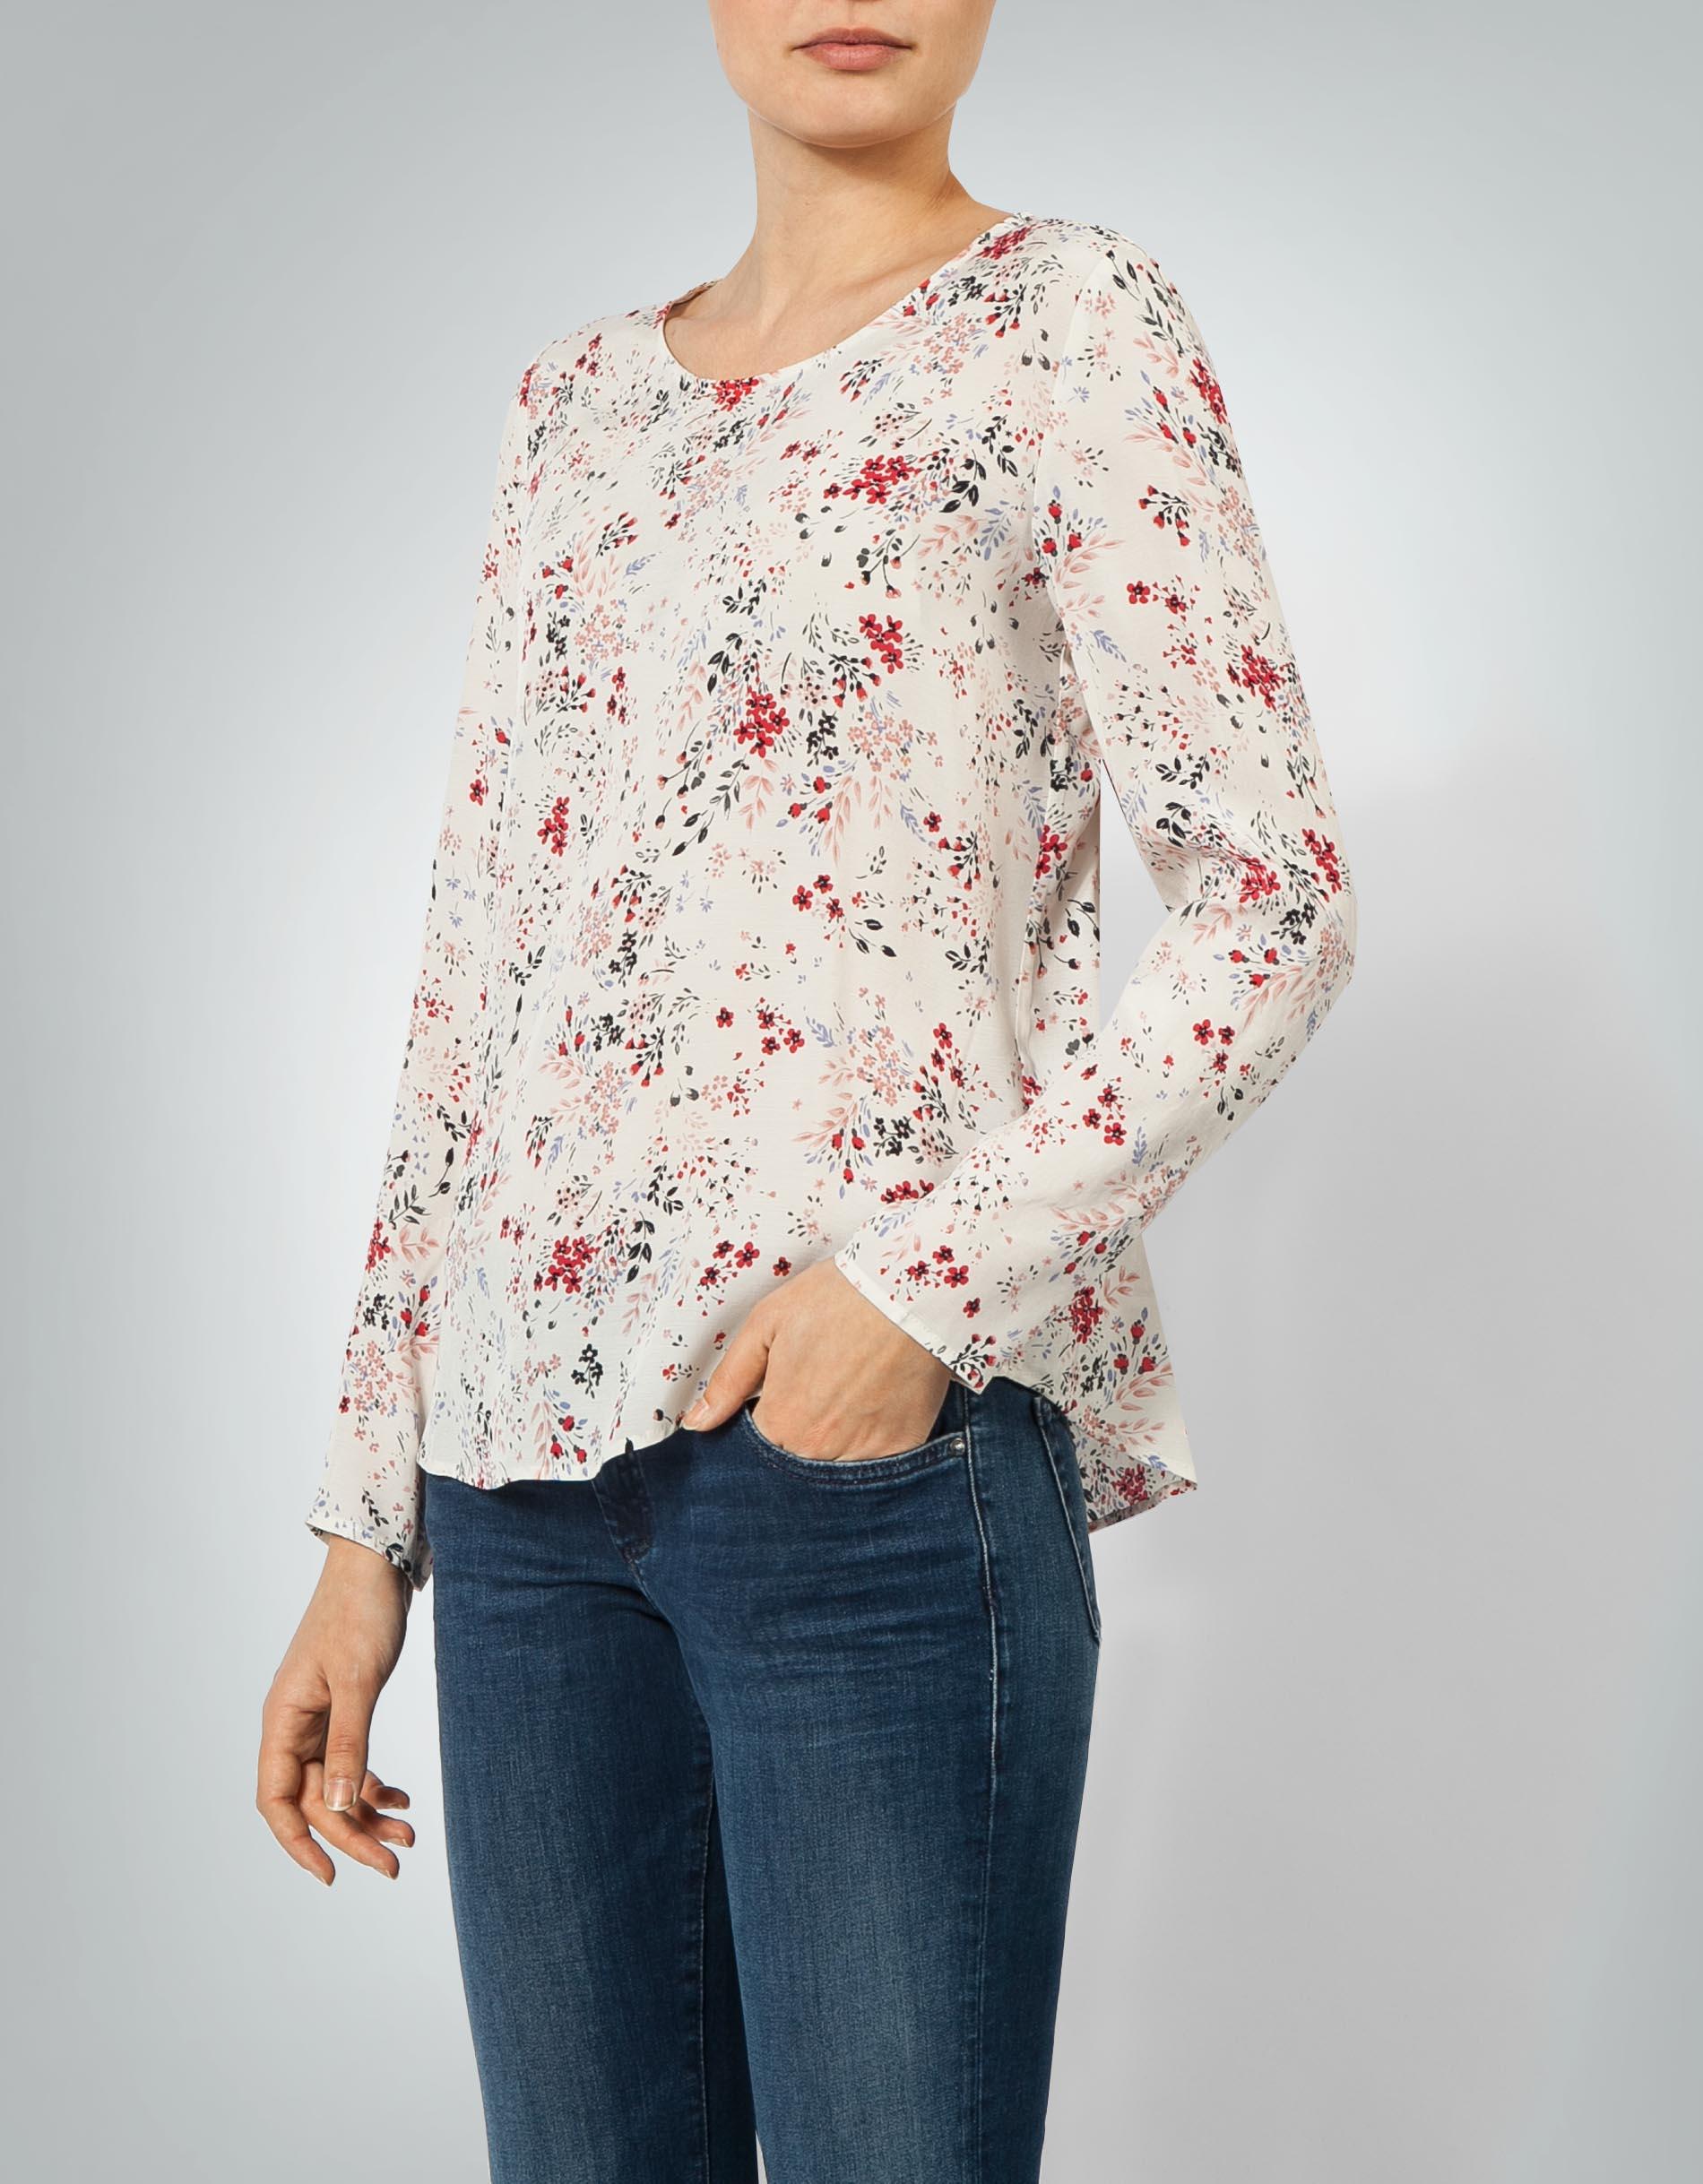 Marc O'Polo Damen Pullover mit Blumenapplikation empfohlen